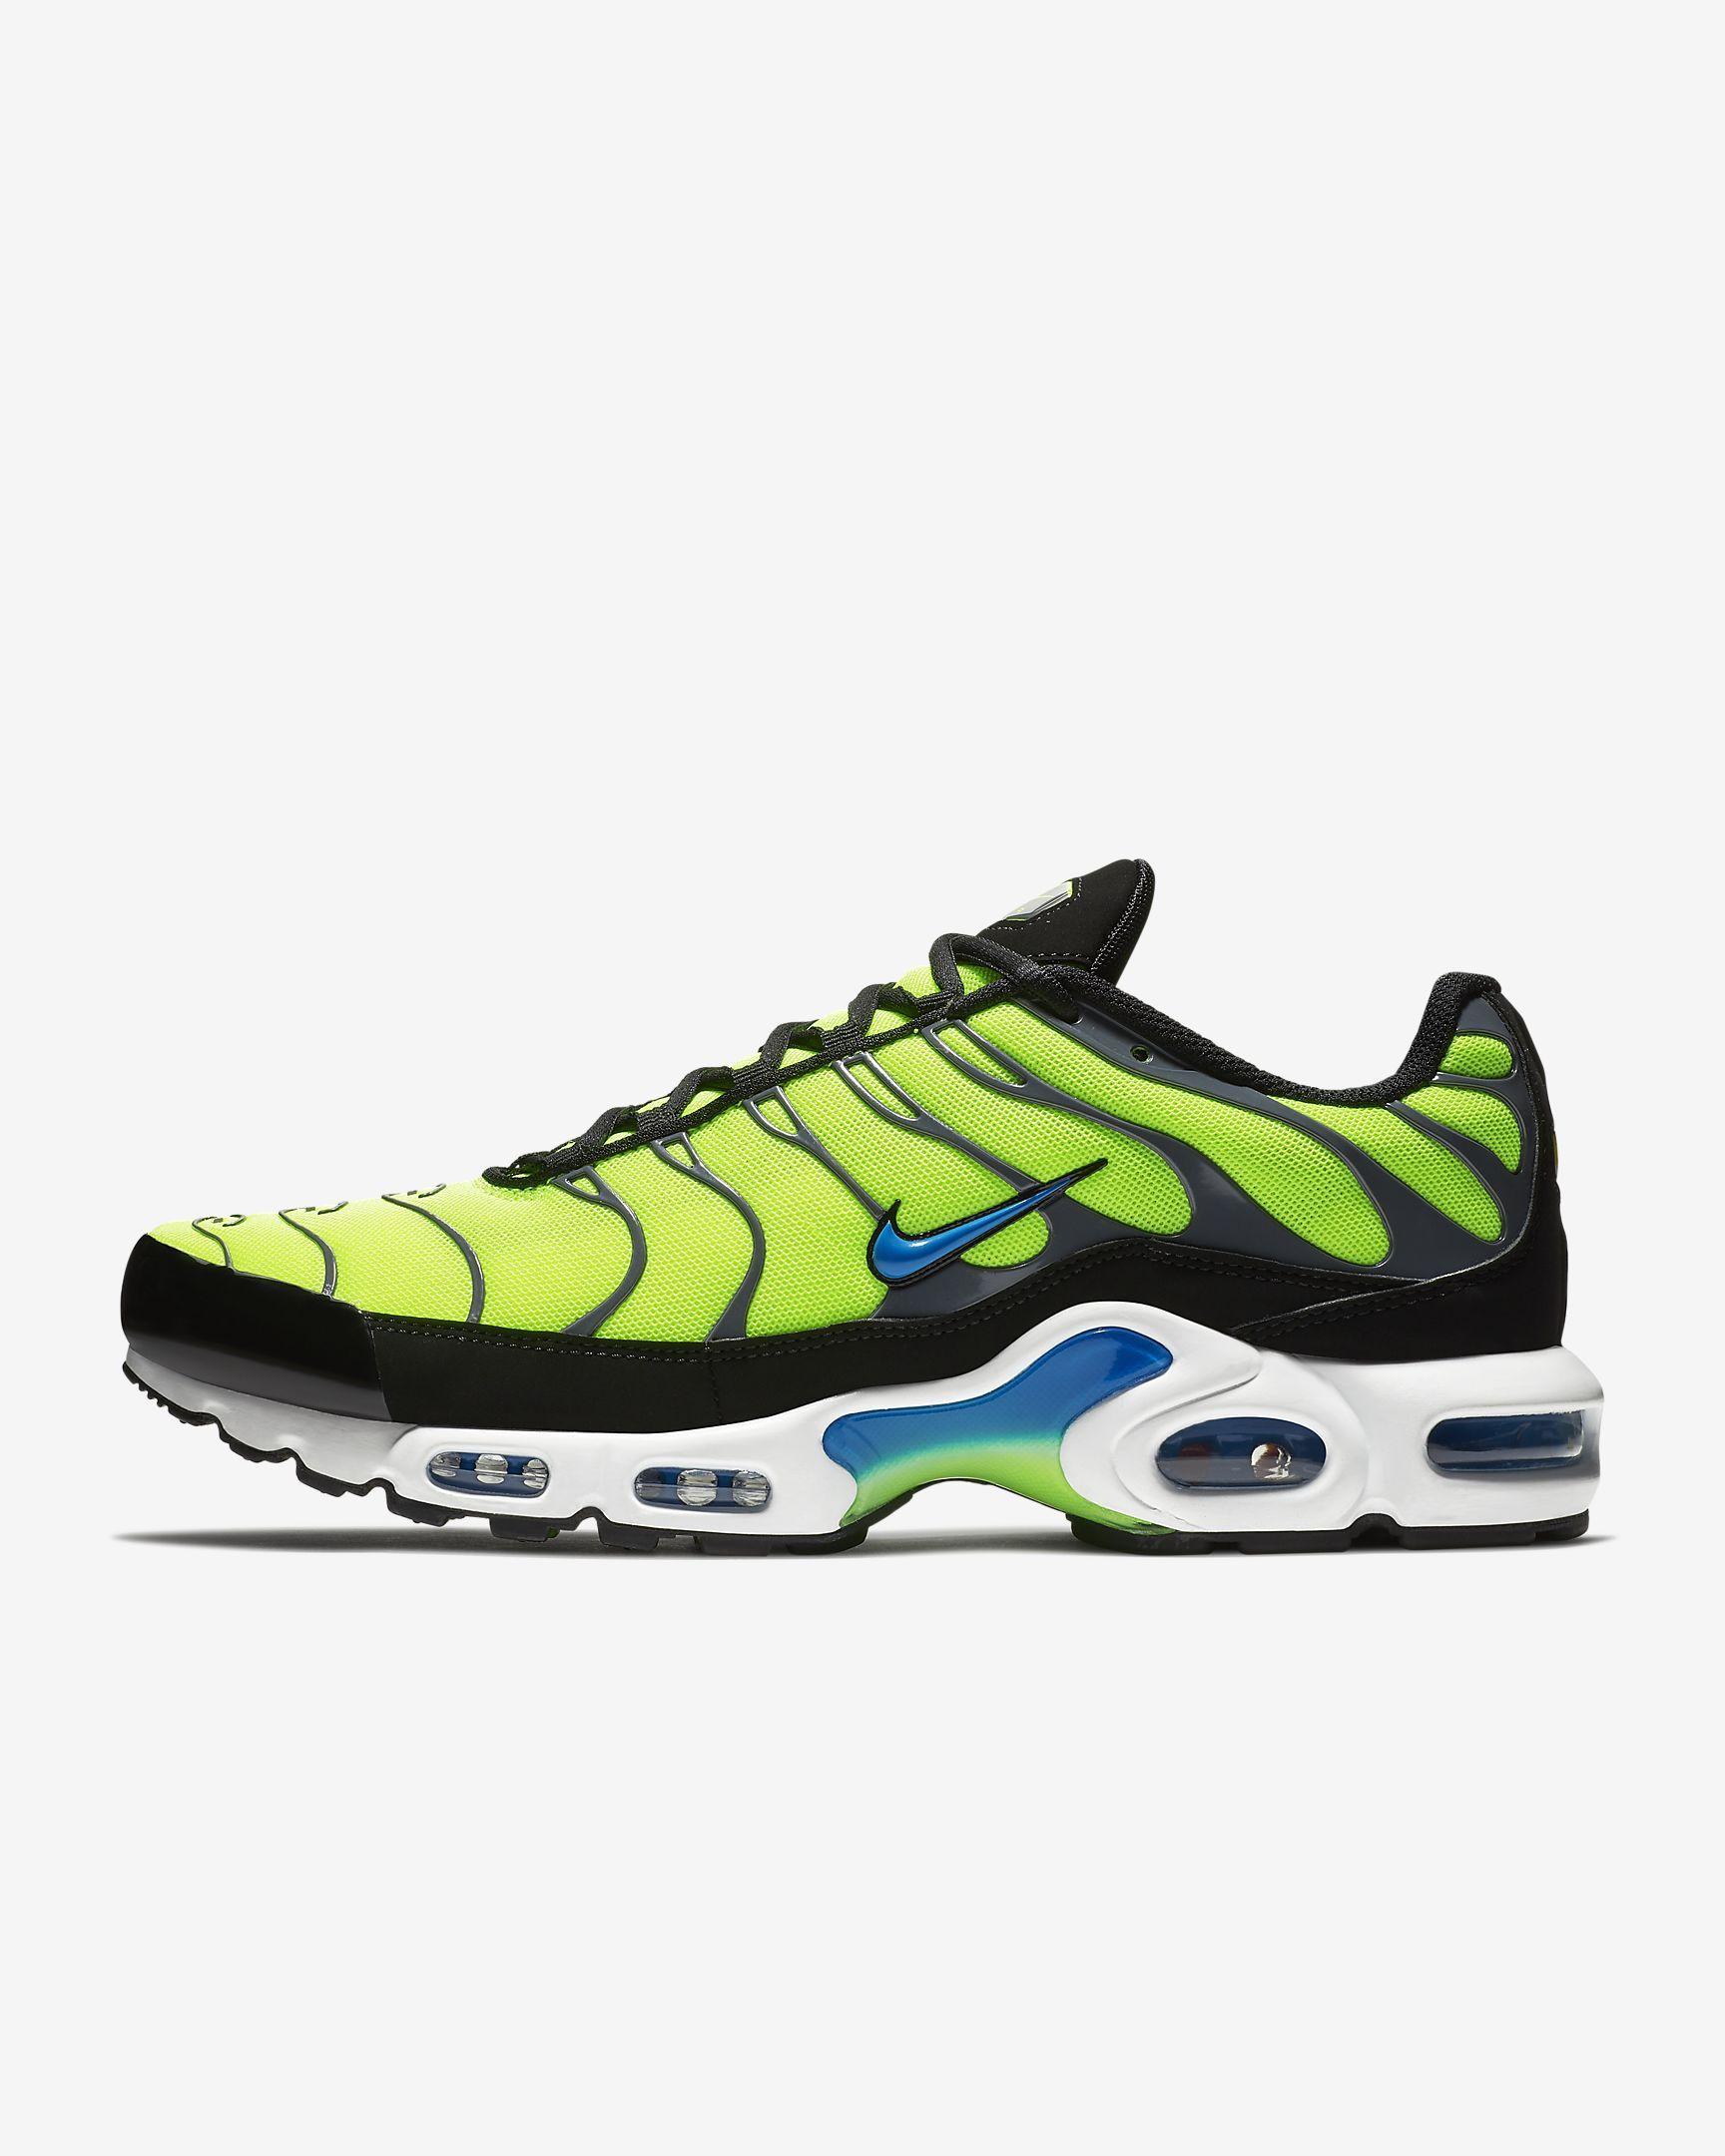 be1e2bda32 Nike Air Max Plus Erkek Ayakkabısı | Shoes Şakir likes